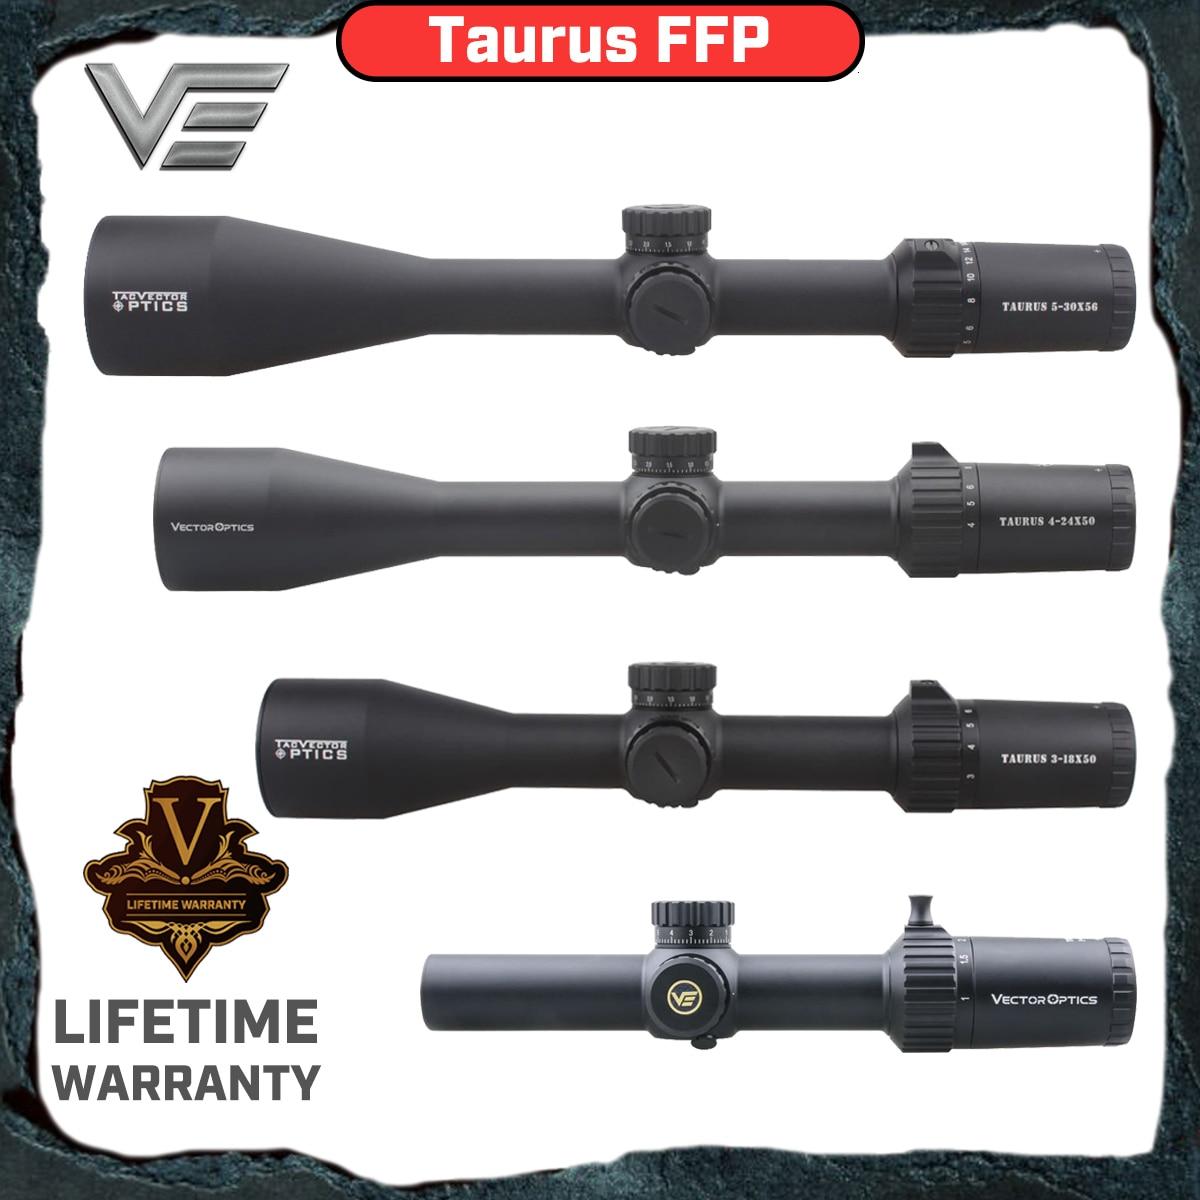 Vector Optics Taurus 1-6x24 3-18x 4-24x 50mm 5-30x 56mm FFP Tactical Präzision Zielfernrohr Hohe Qualität Lange Palette Jagd umfang